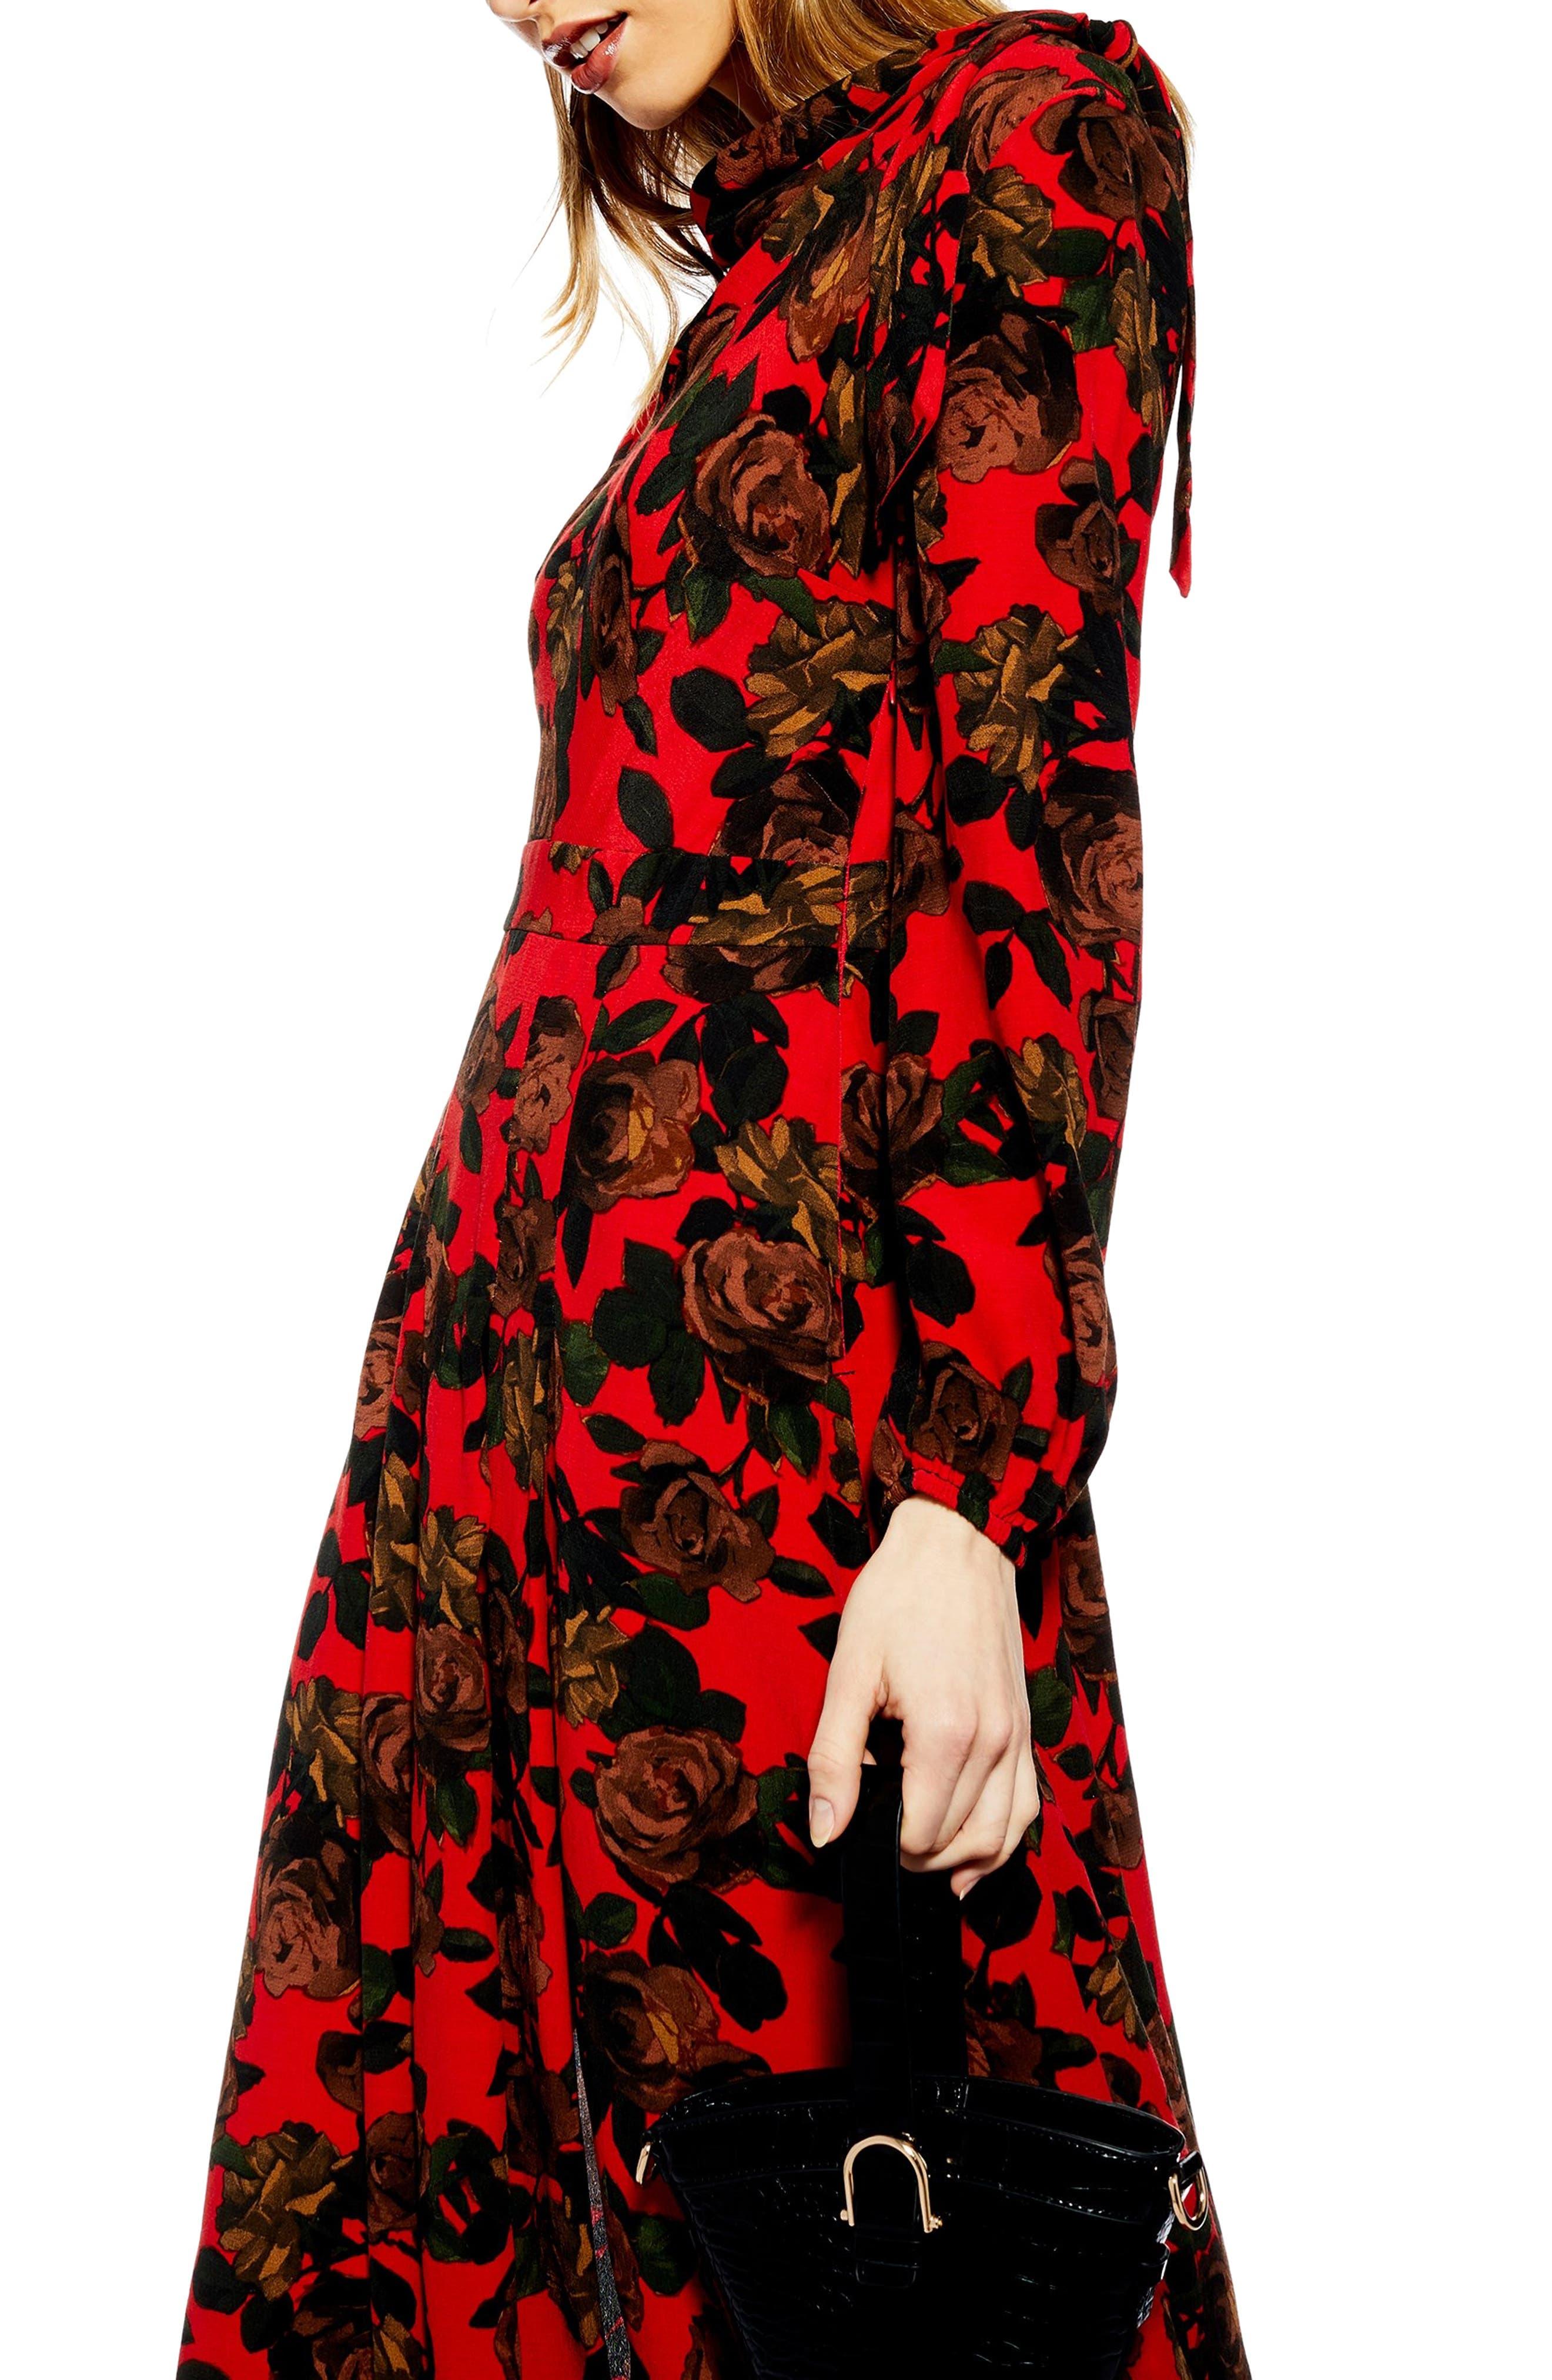 TOPSHOP,                             Rose Cut Tie Neck Midi Dress,                             Alternate thumbnail 3, color,                             RED MULTI